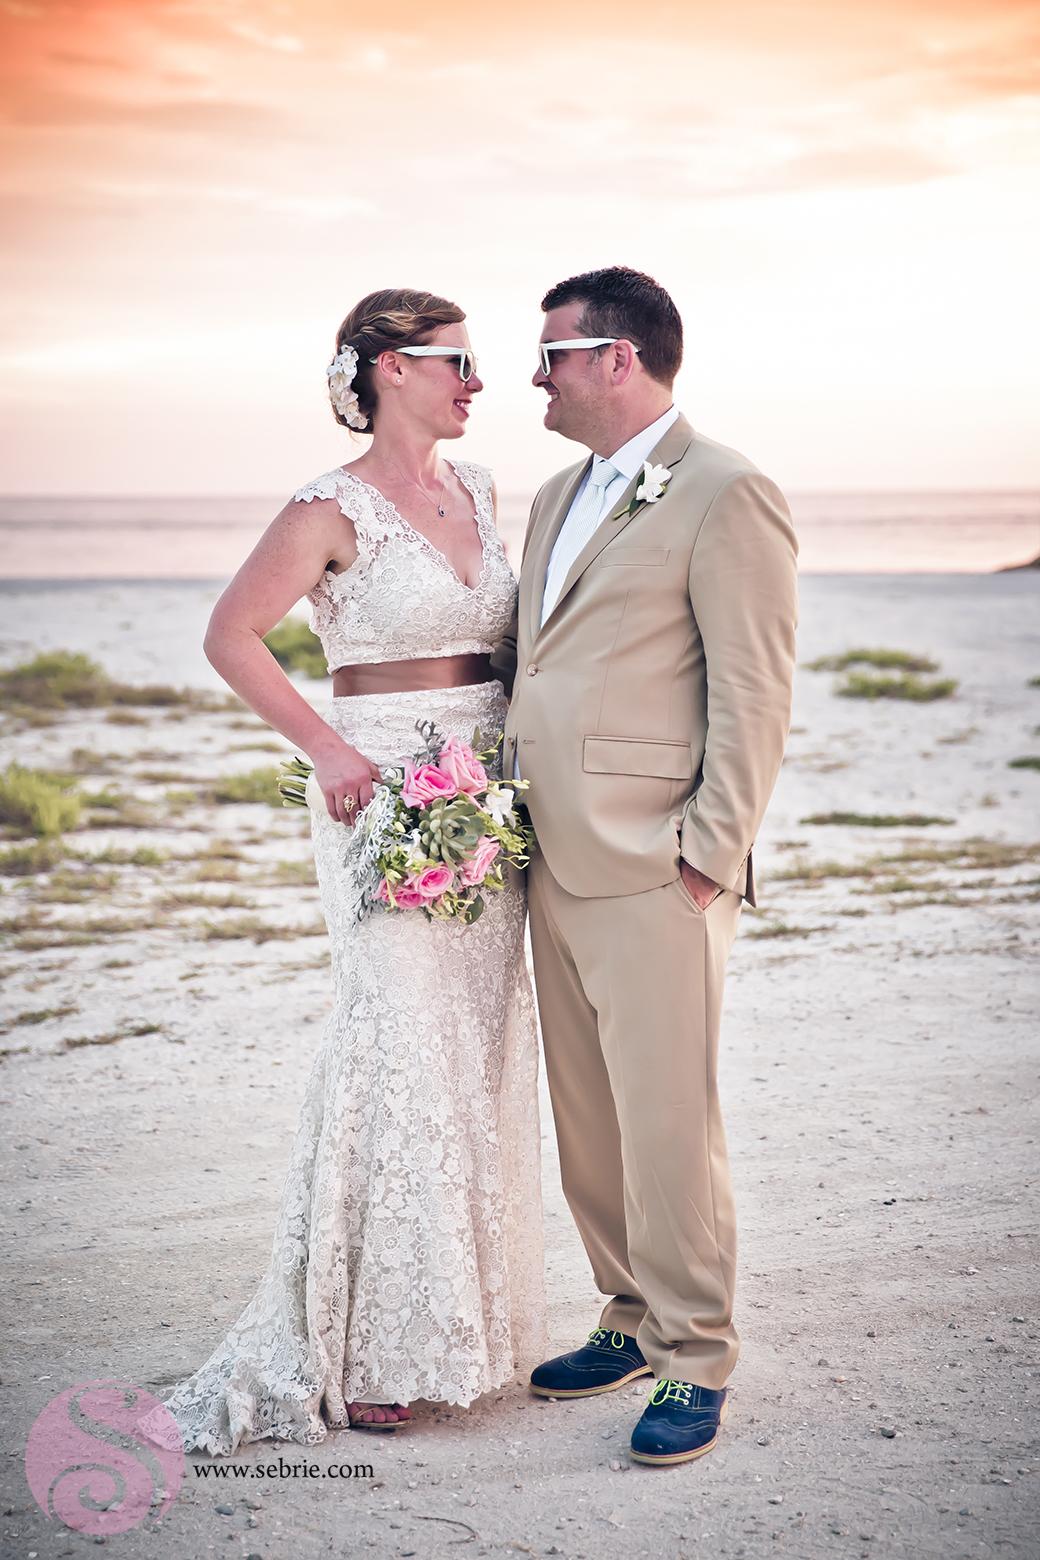 couple-sunglasses